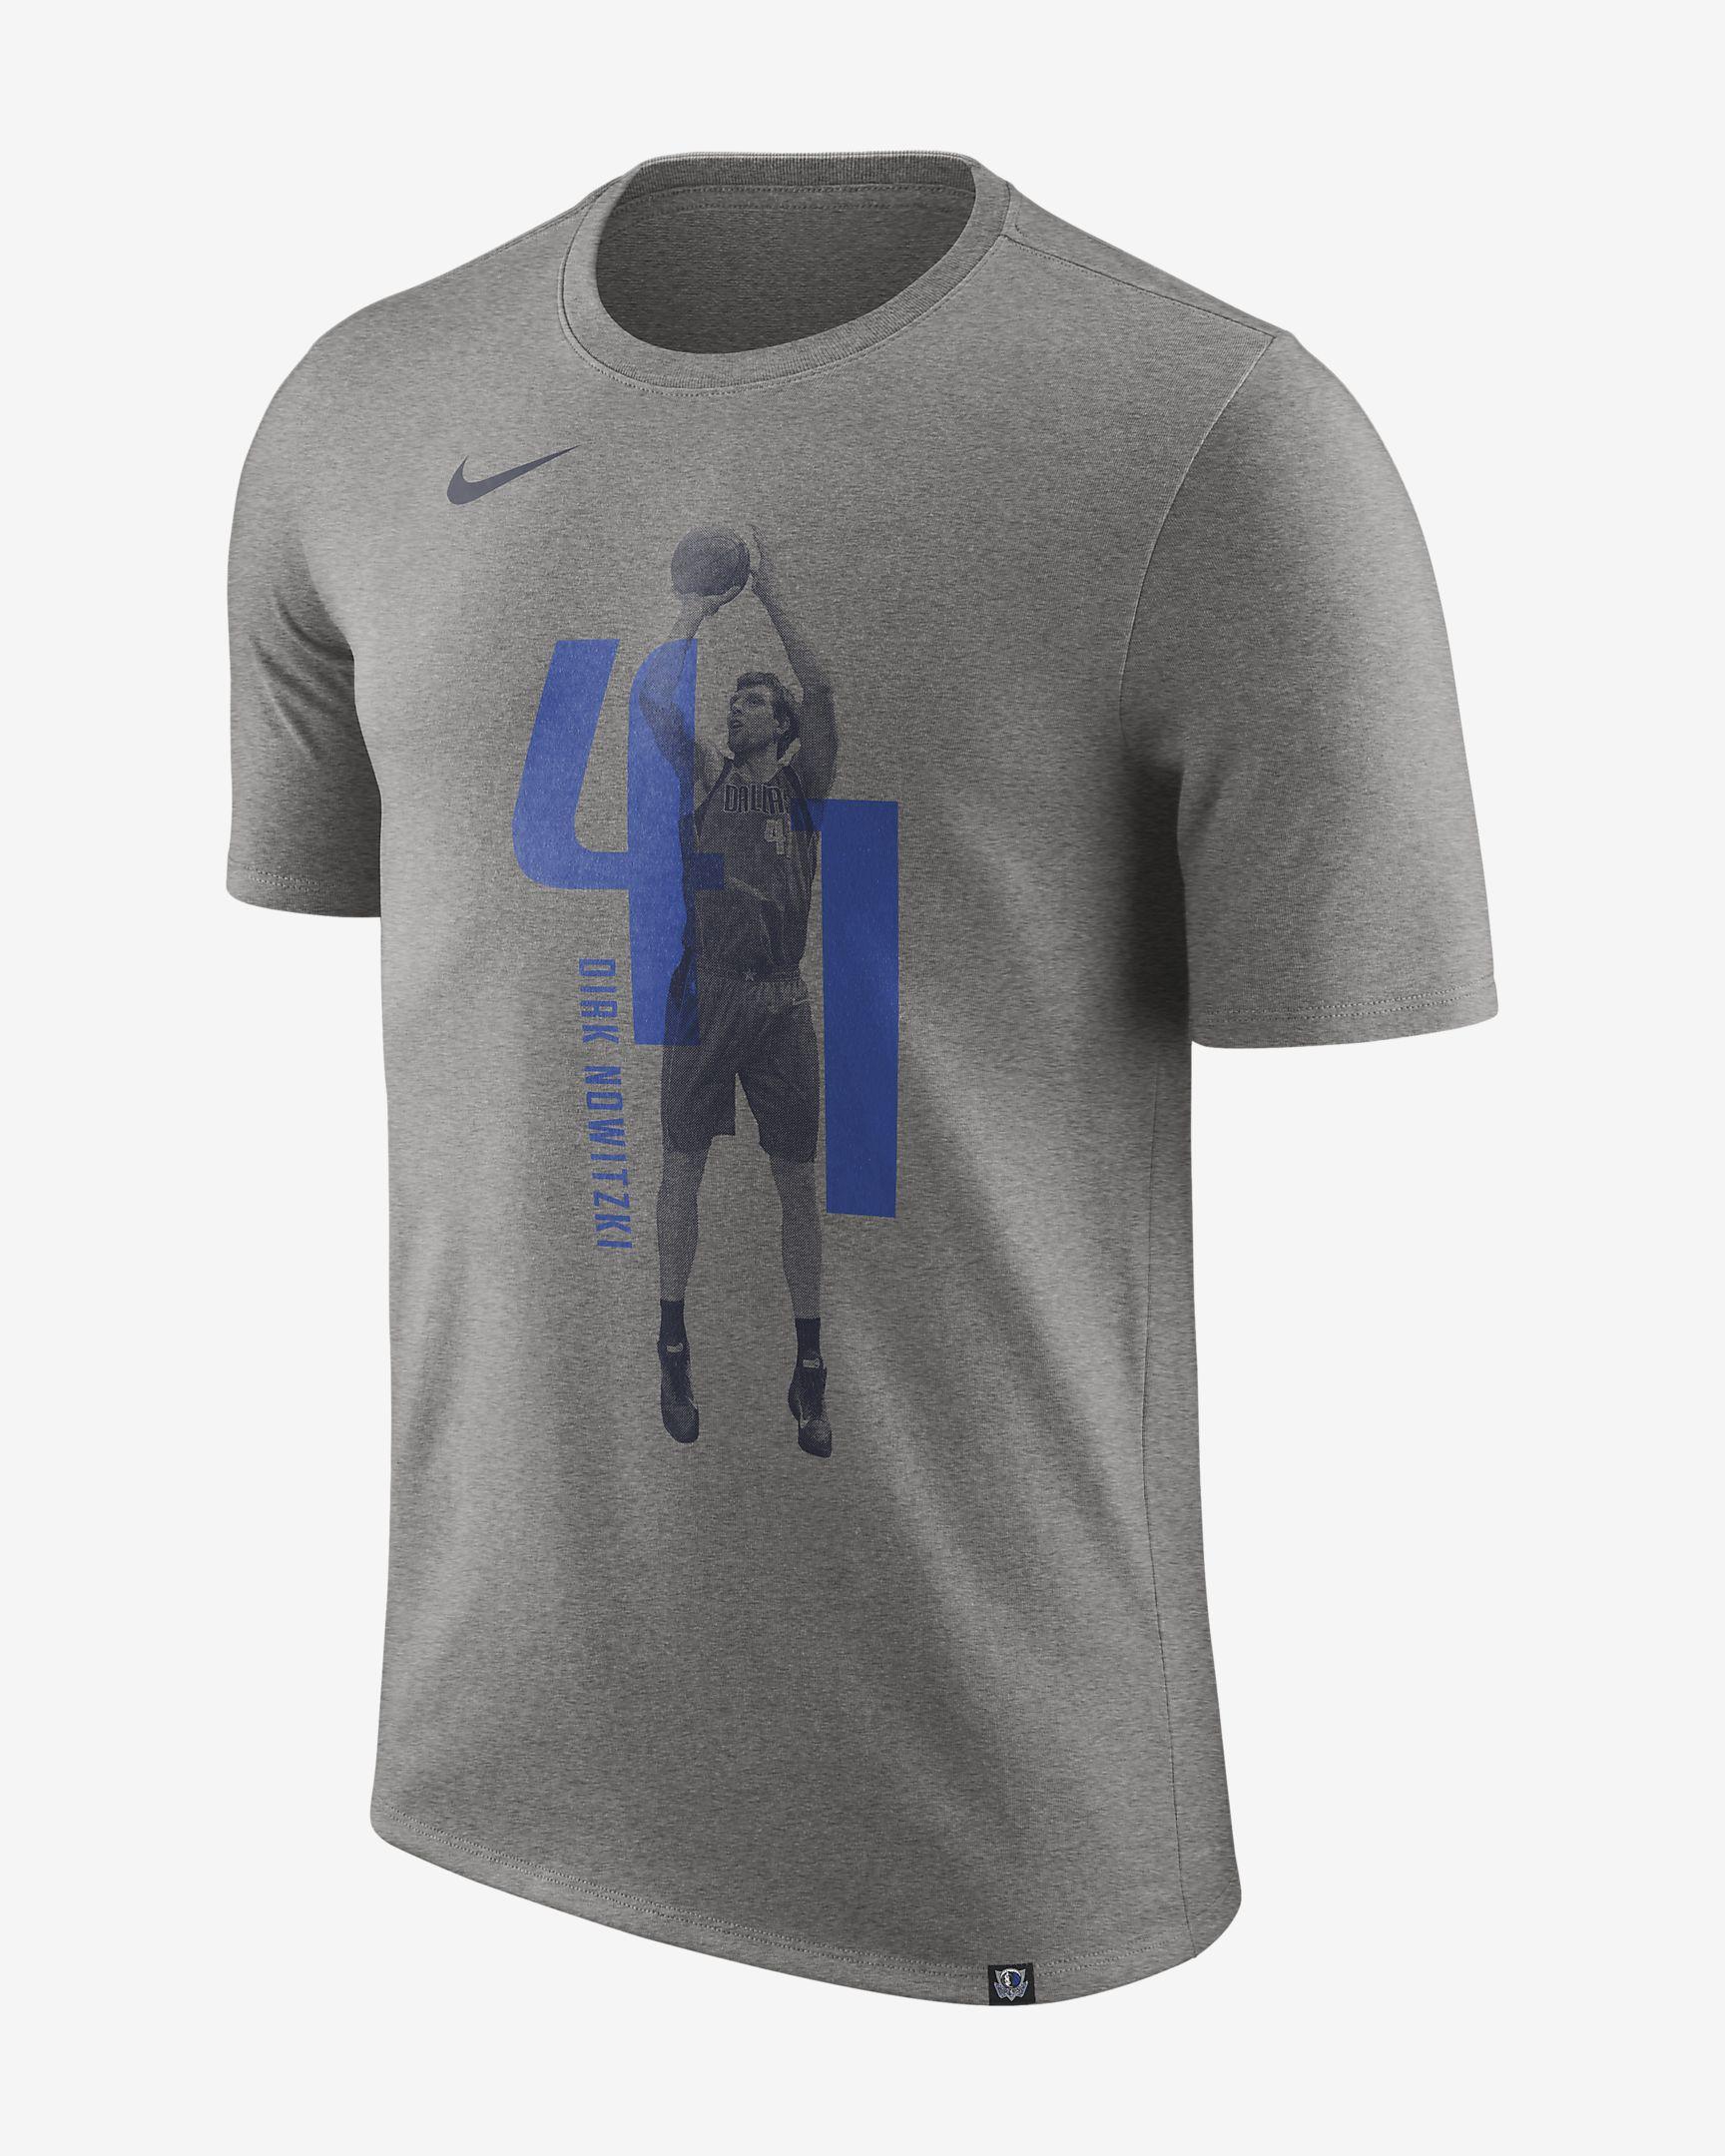 premium selection 7a663 0d459 Nike Dallas Mavericks Dirk Nowitzki Dry Tee - NBA Shop ...